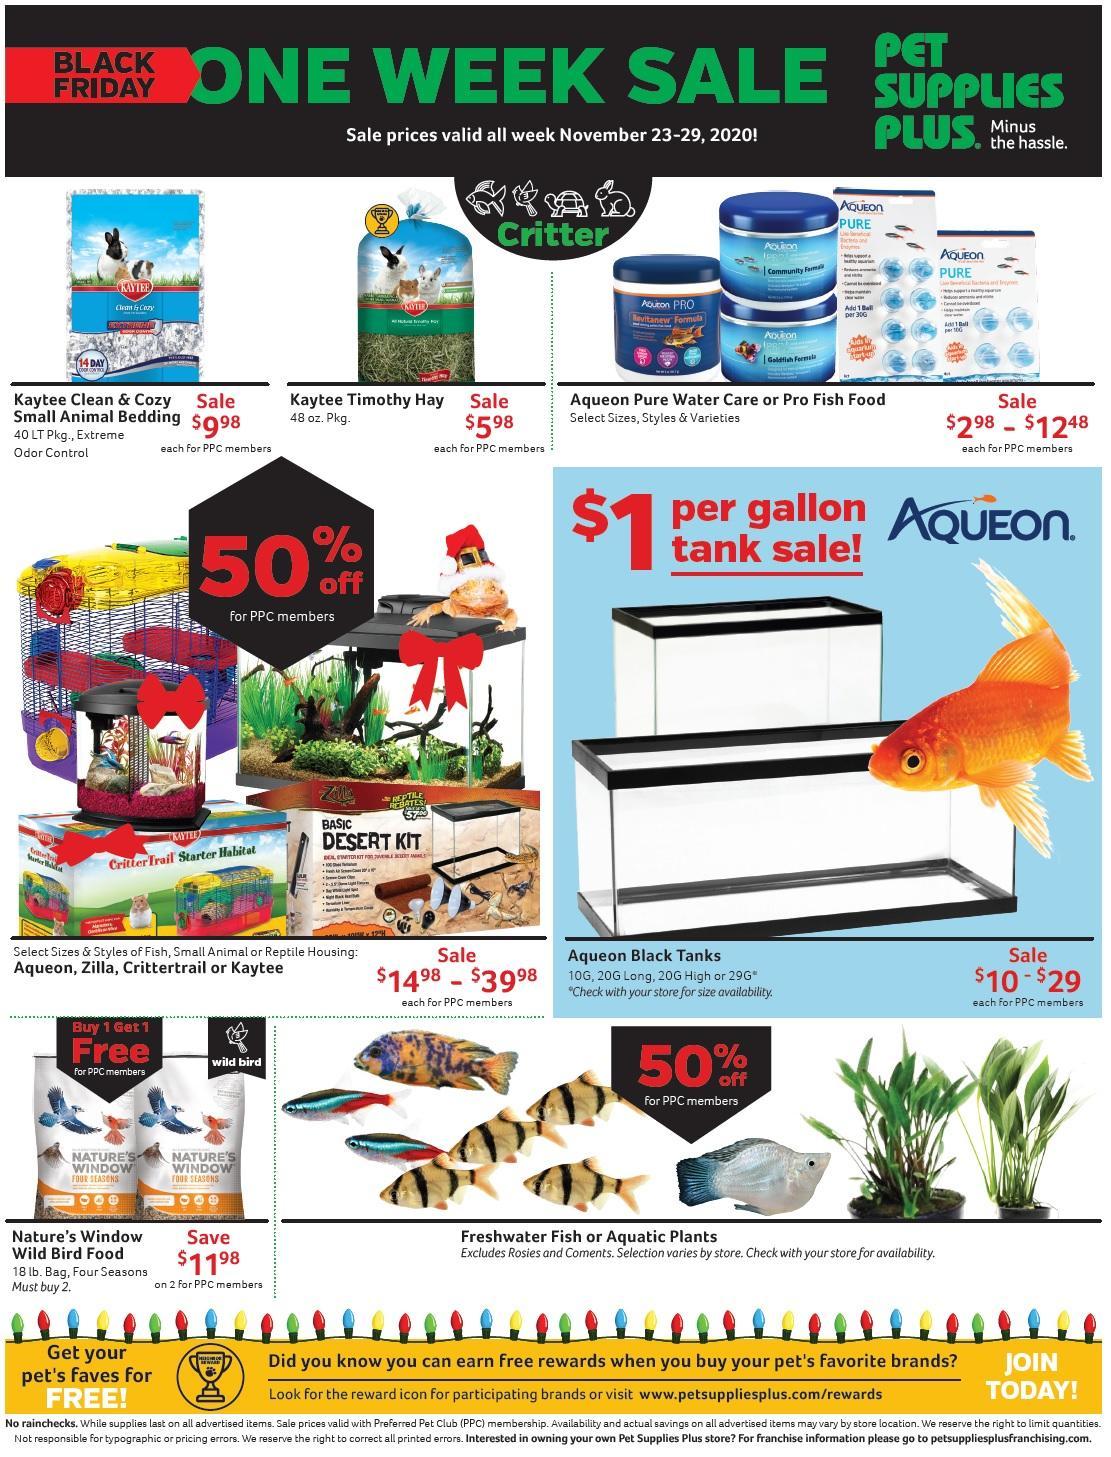 Pet Supplies Plus Black Friday 2020 Page 6